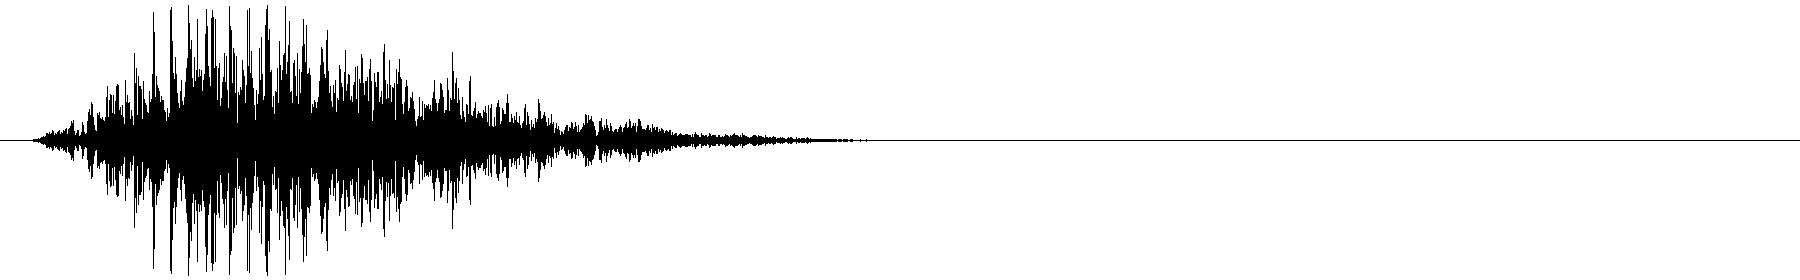 vox 028